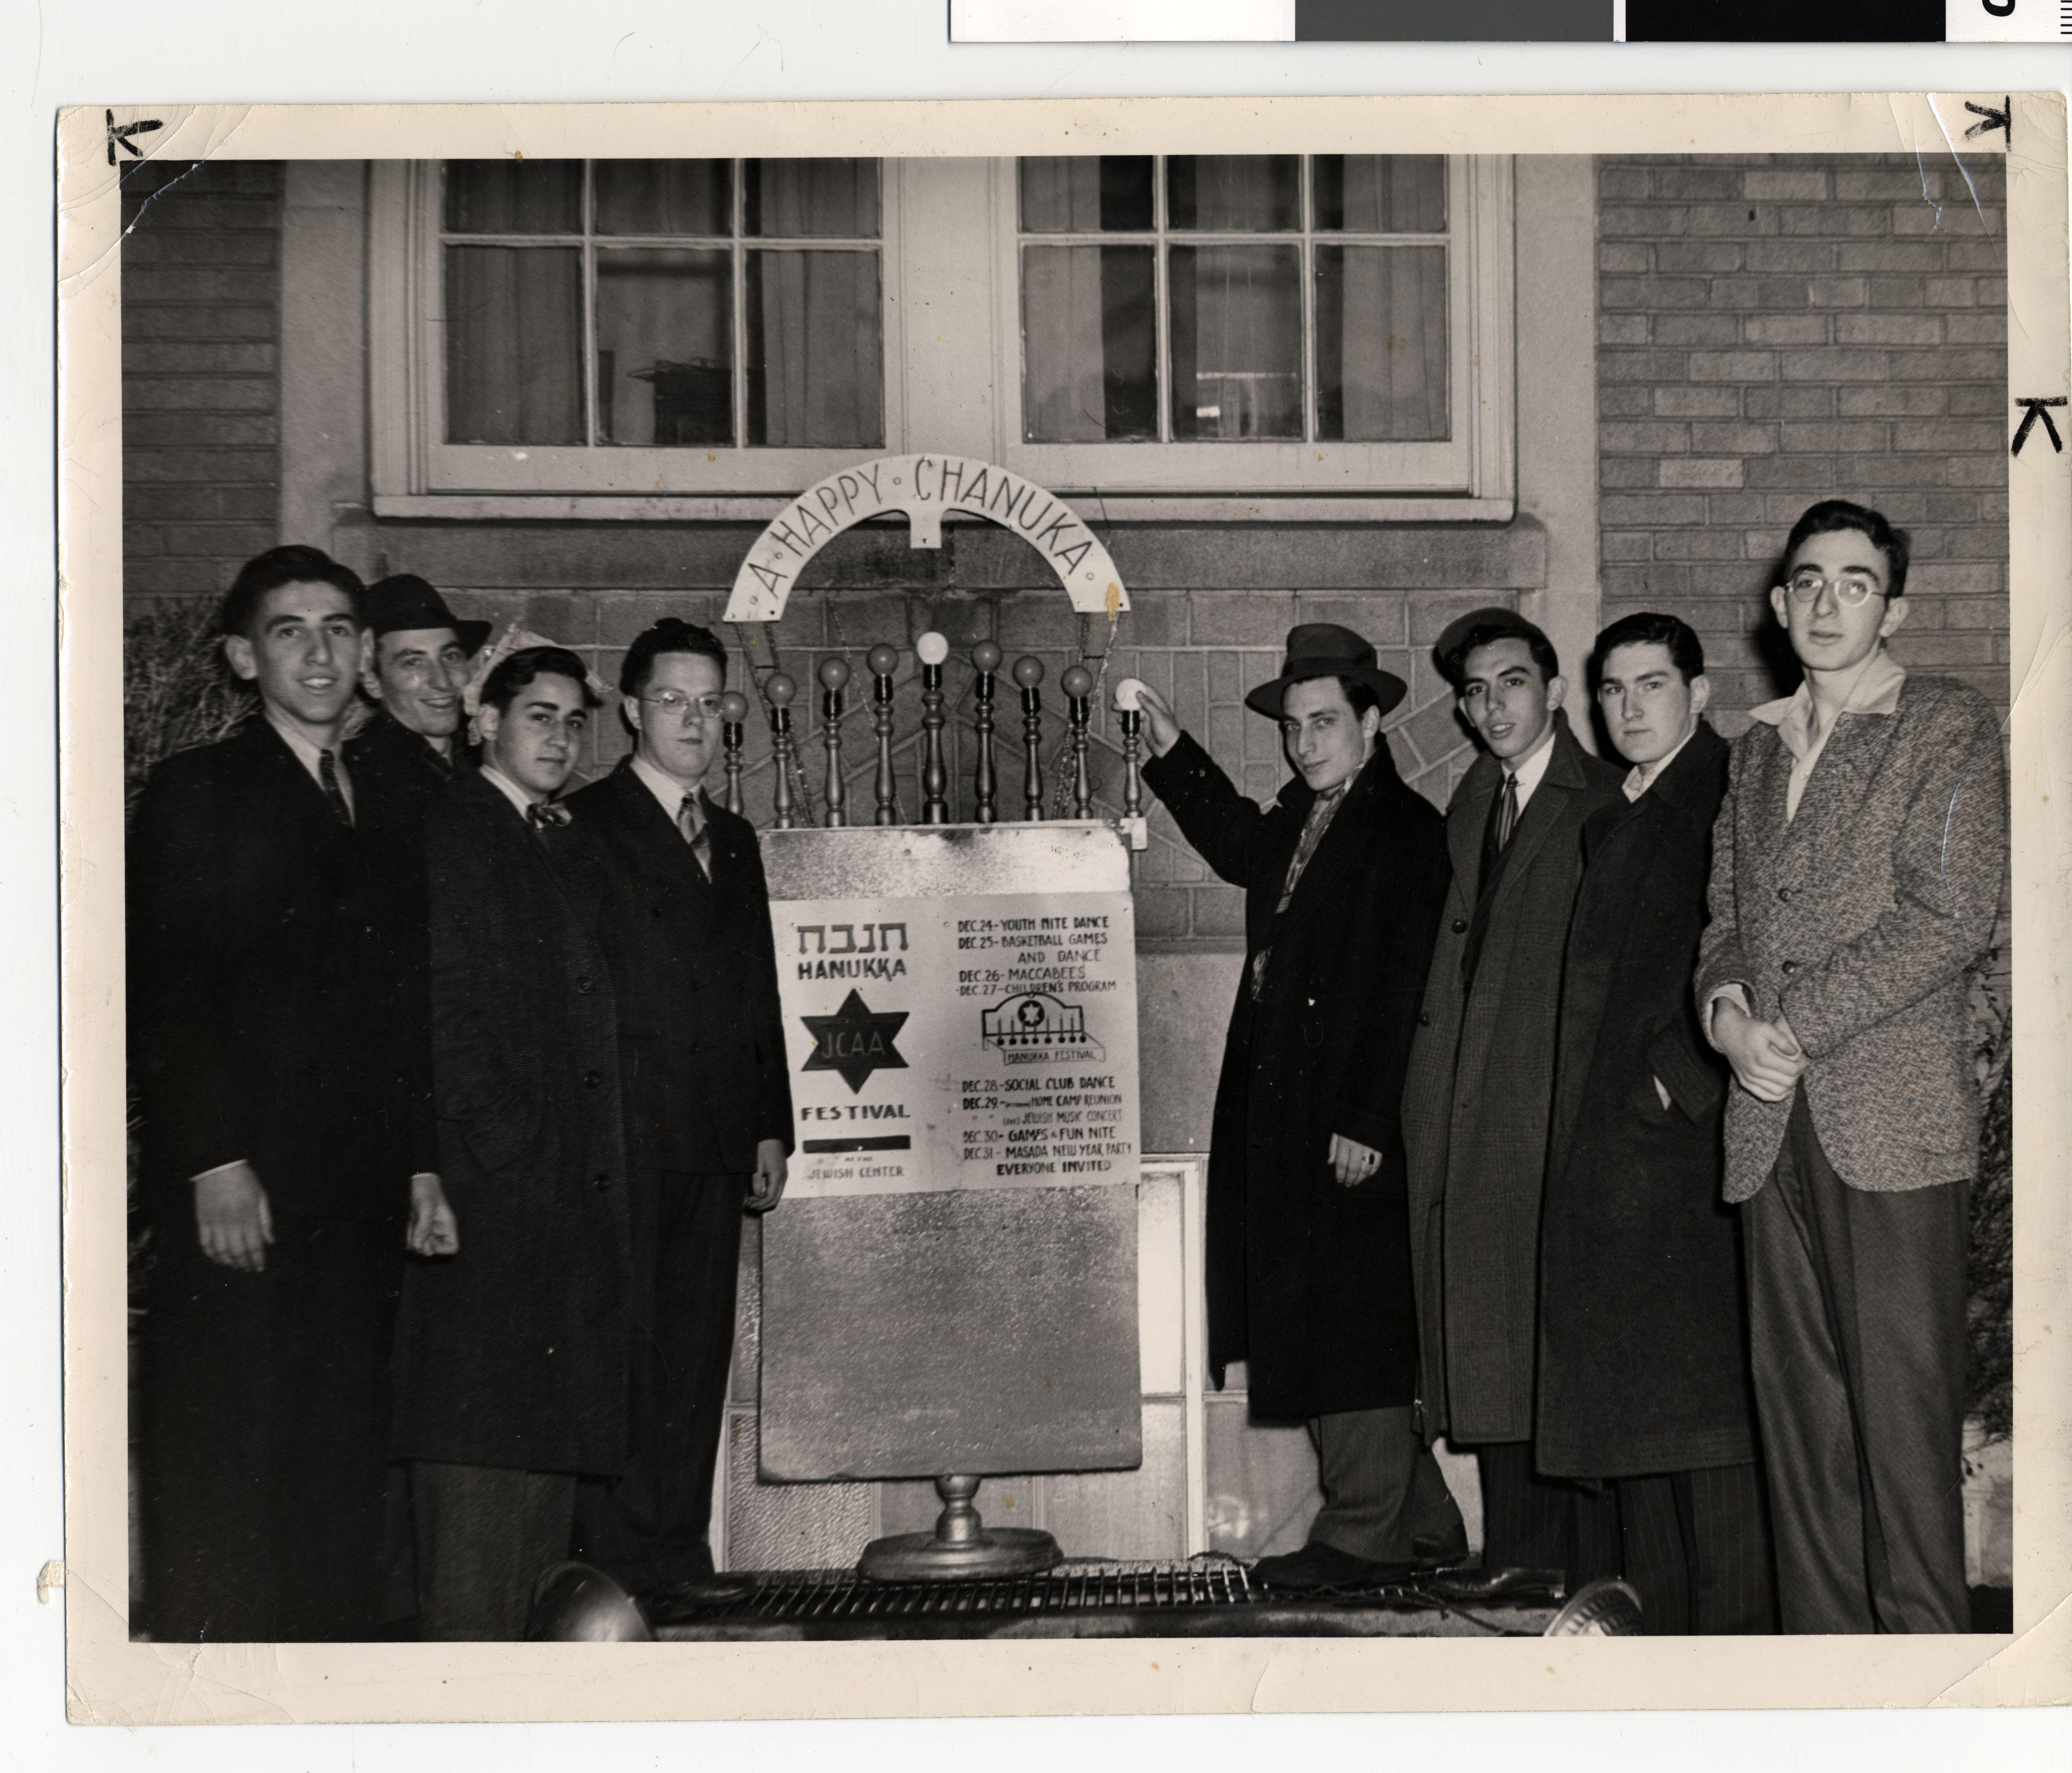 Minnesota's Jewish history documented online in MNopedia